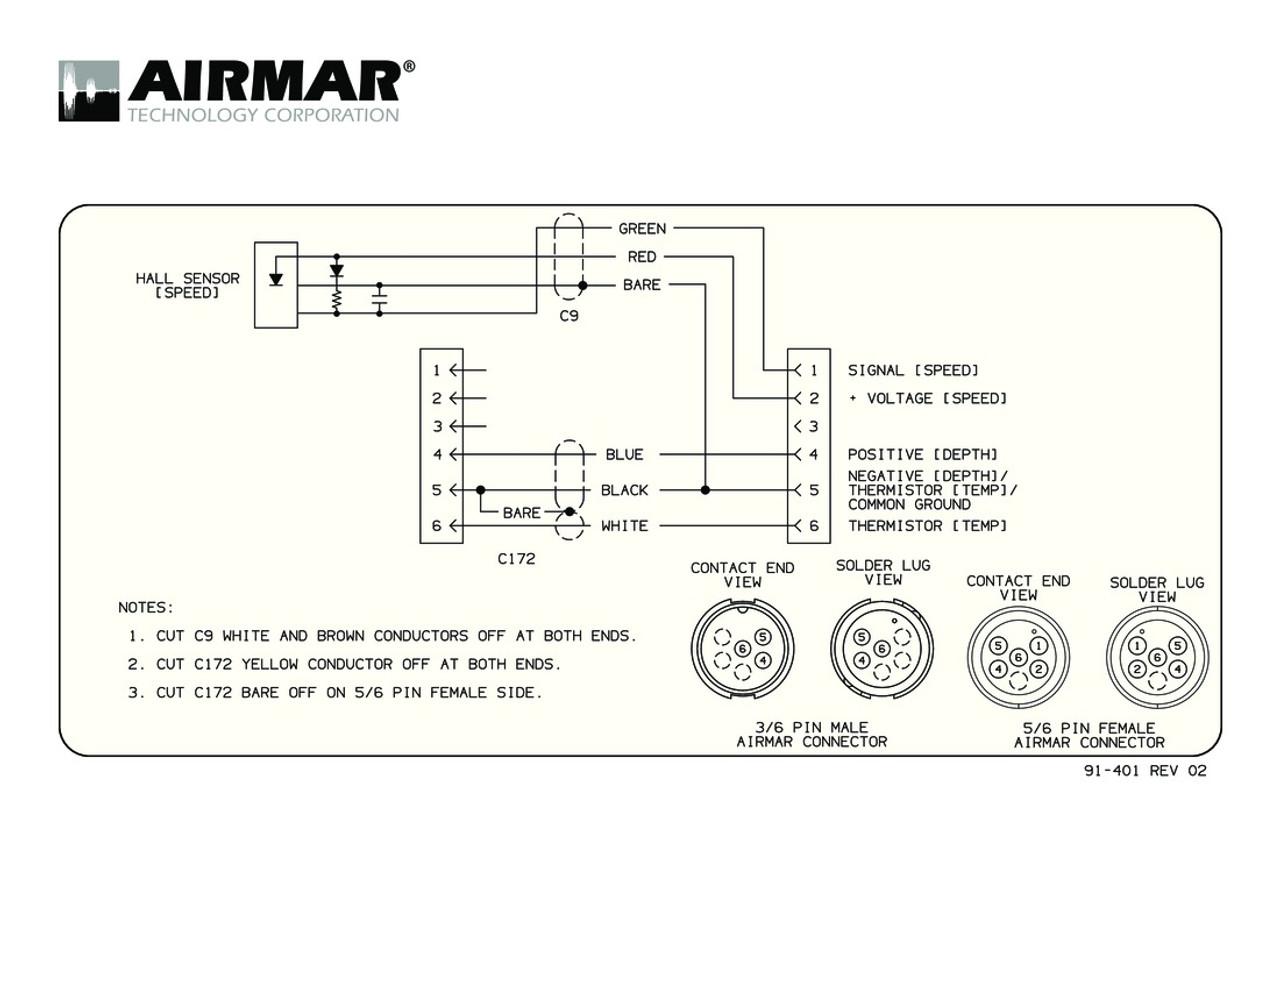 small resolution of garmin fish finder wiring diagram wiring library garmin fish finder wiring diagram